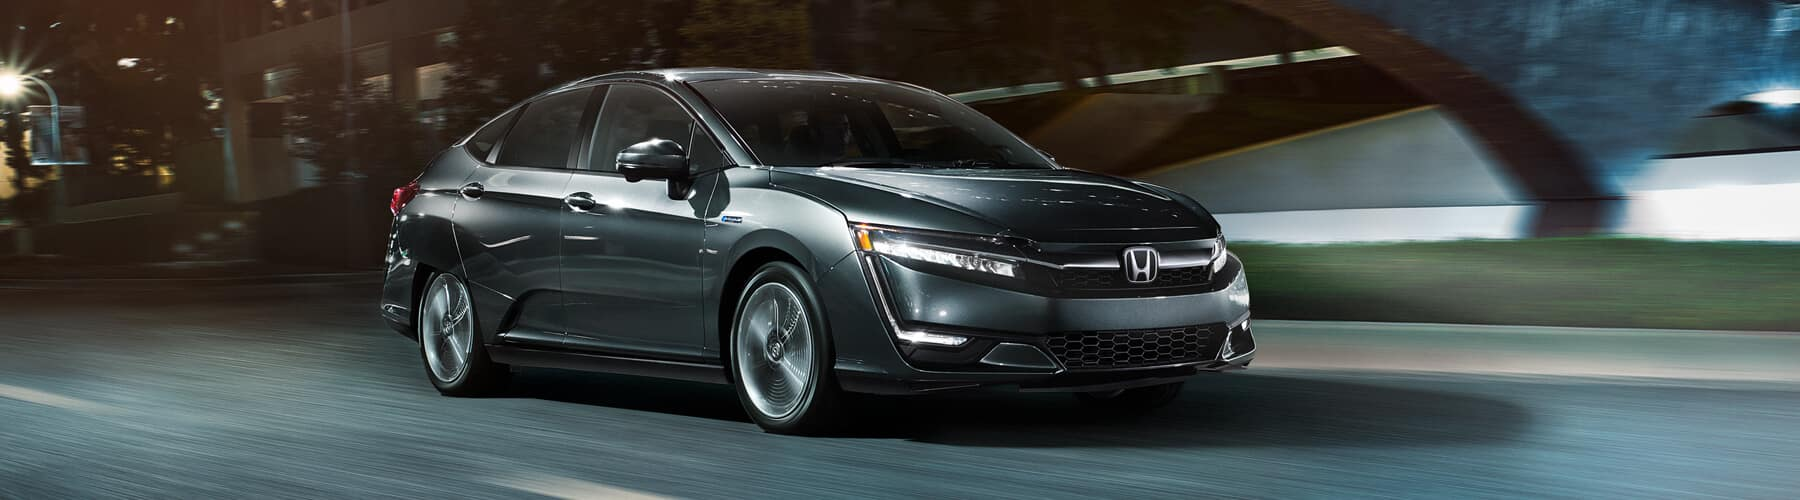 2019 Honda Clarity Plug-In Hybrid Banner